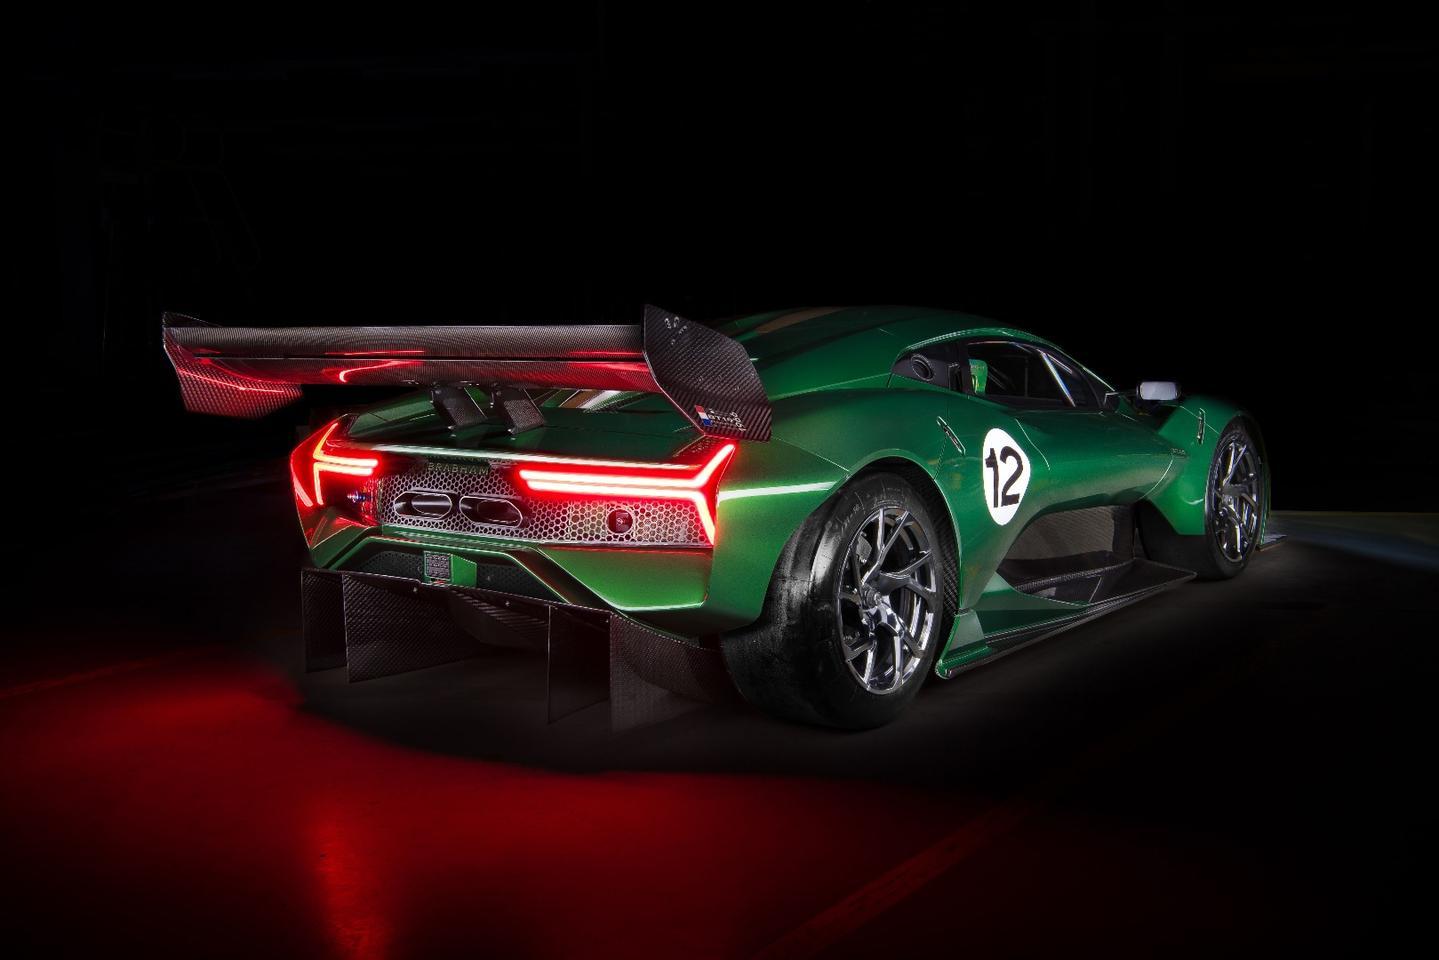 The aerodynamics of the Brabham BT62 impart 1,200 kilos of downforce at speed